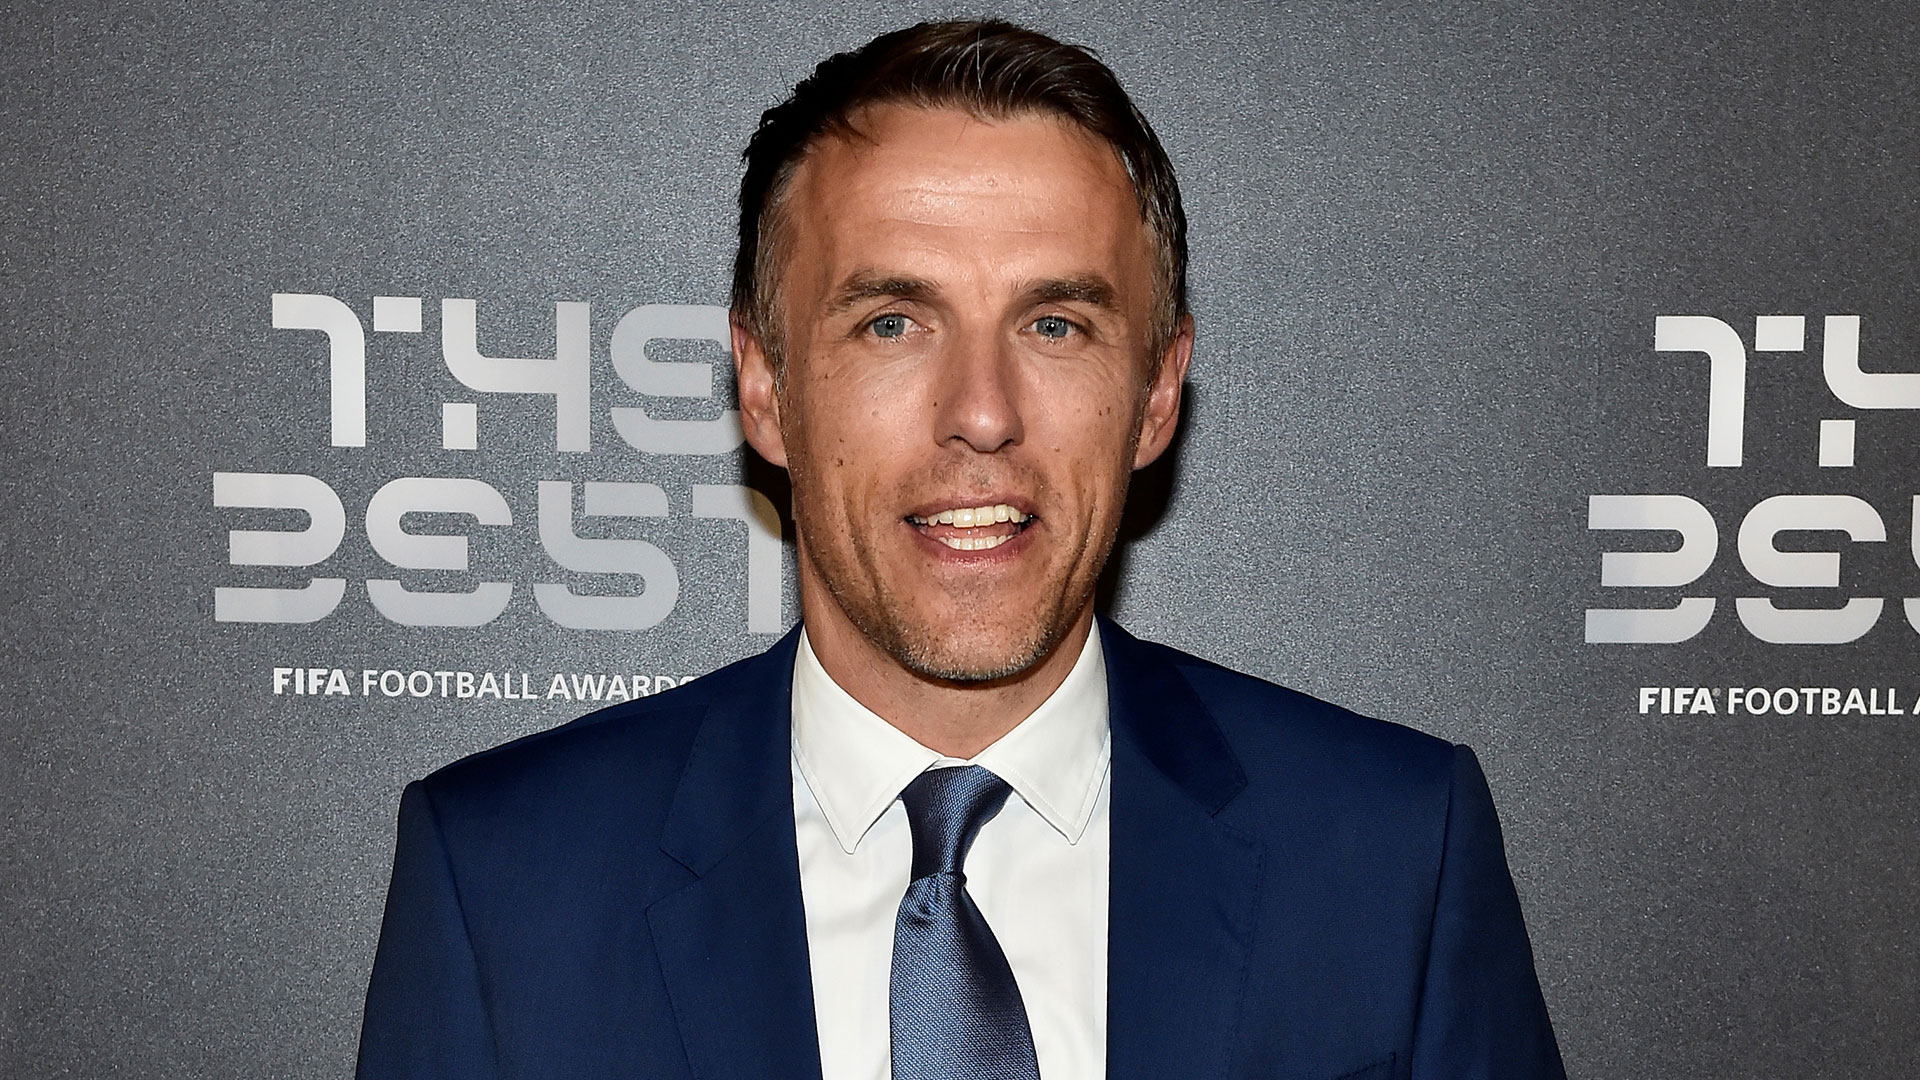 Phil Neville, entrenador de la selección de Inglaterra